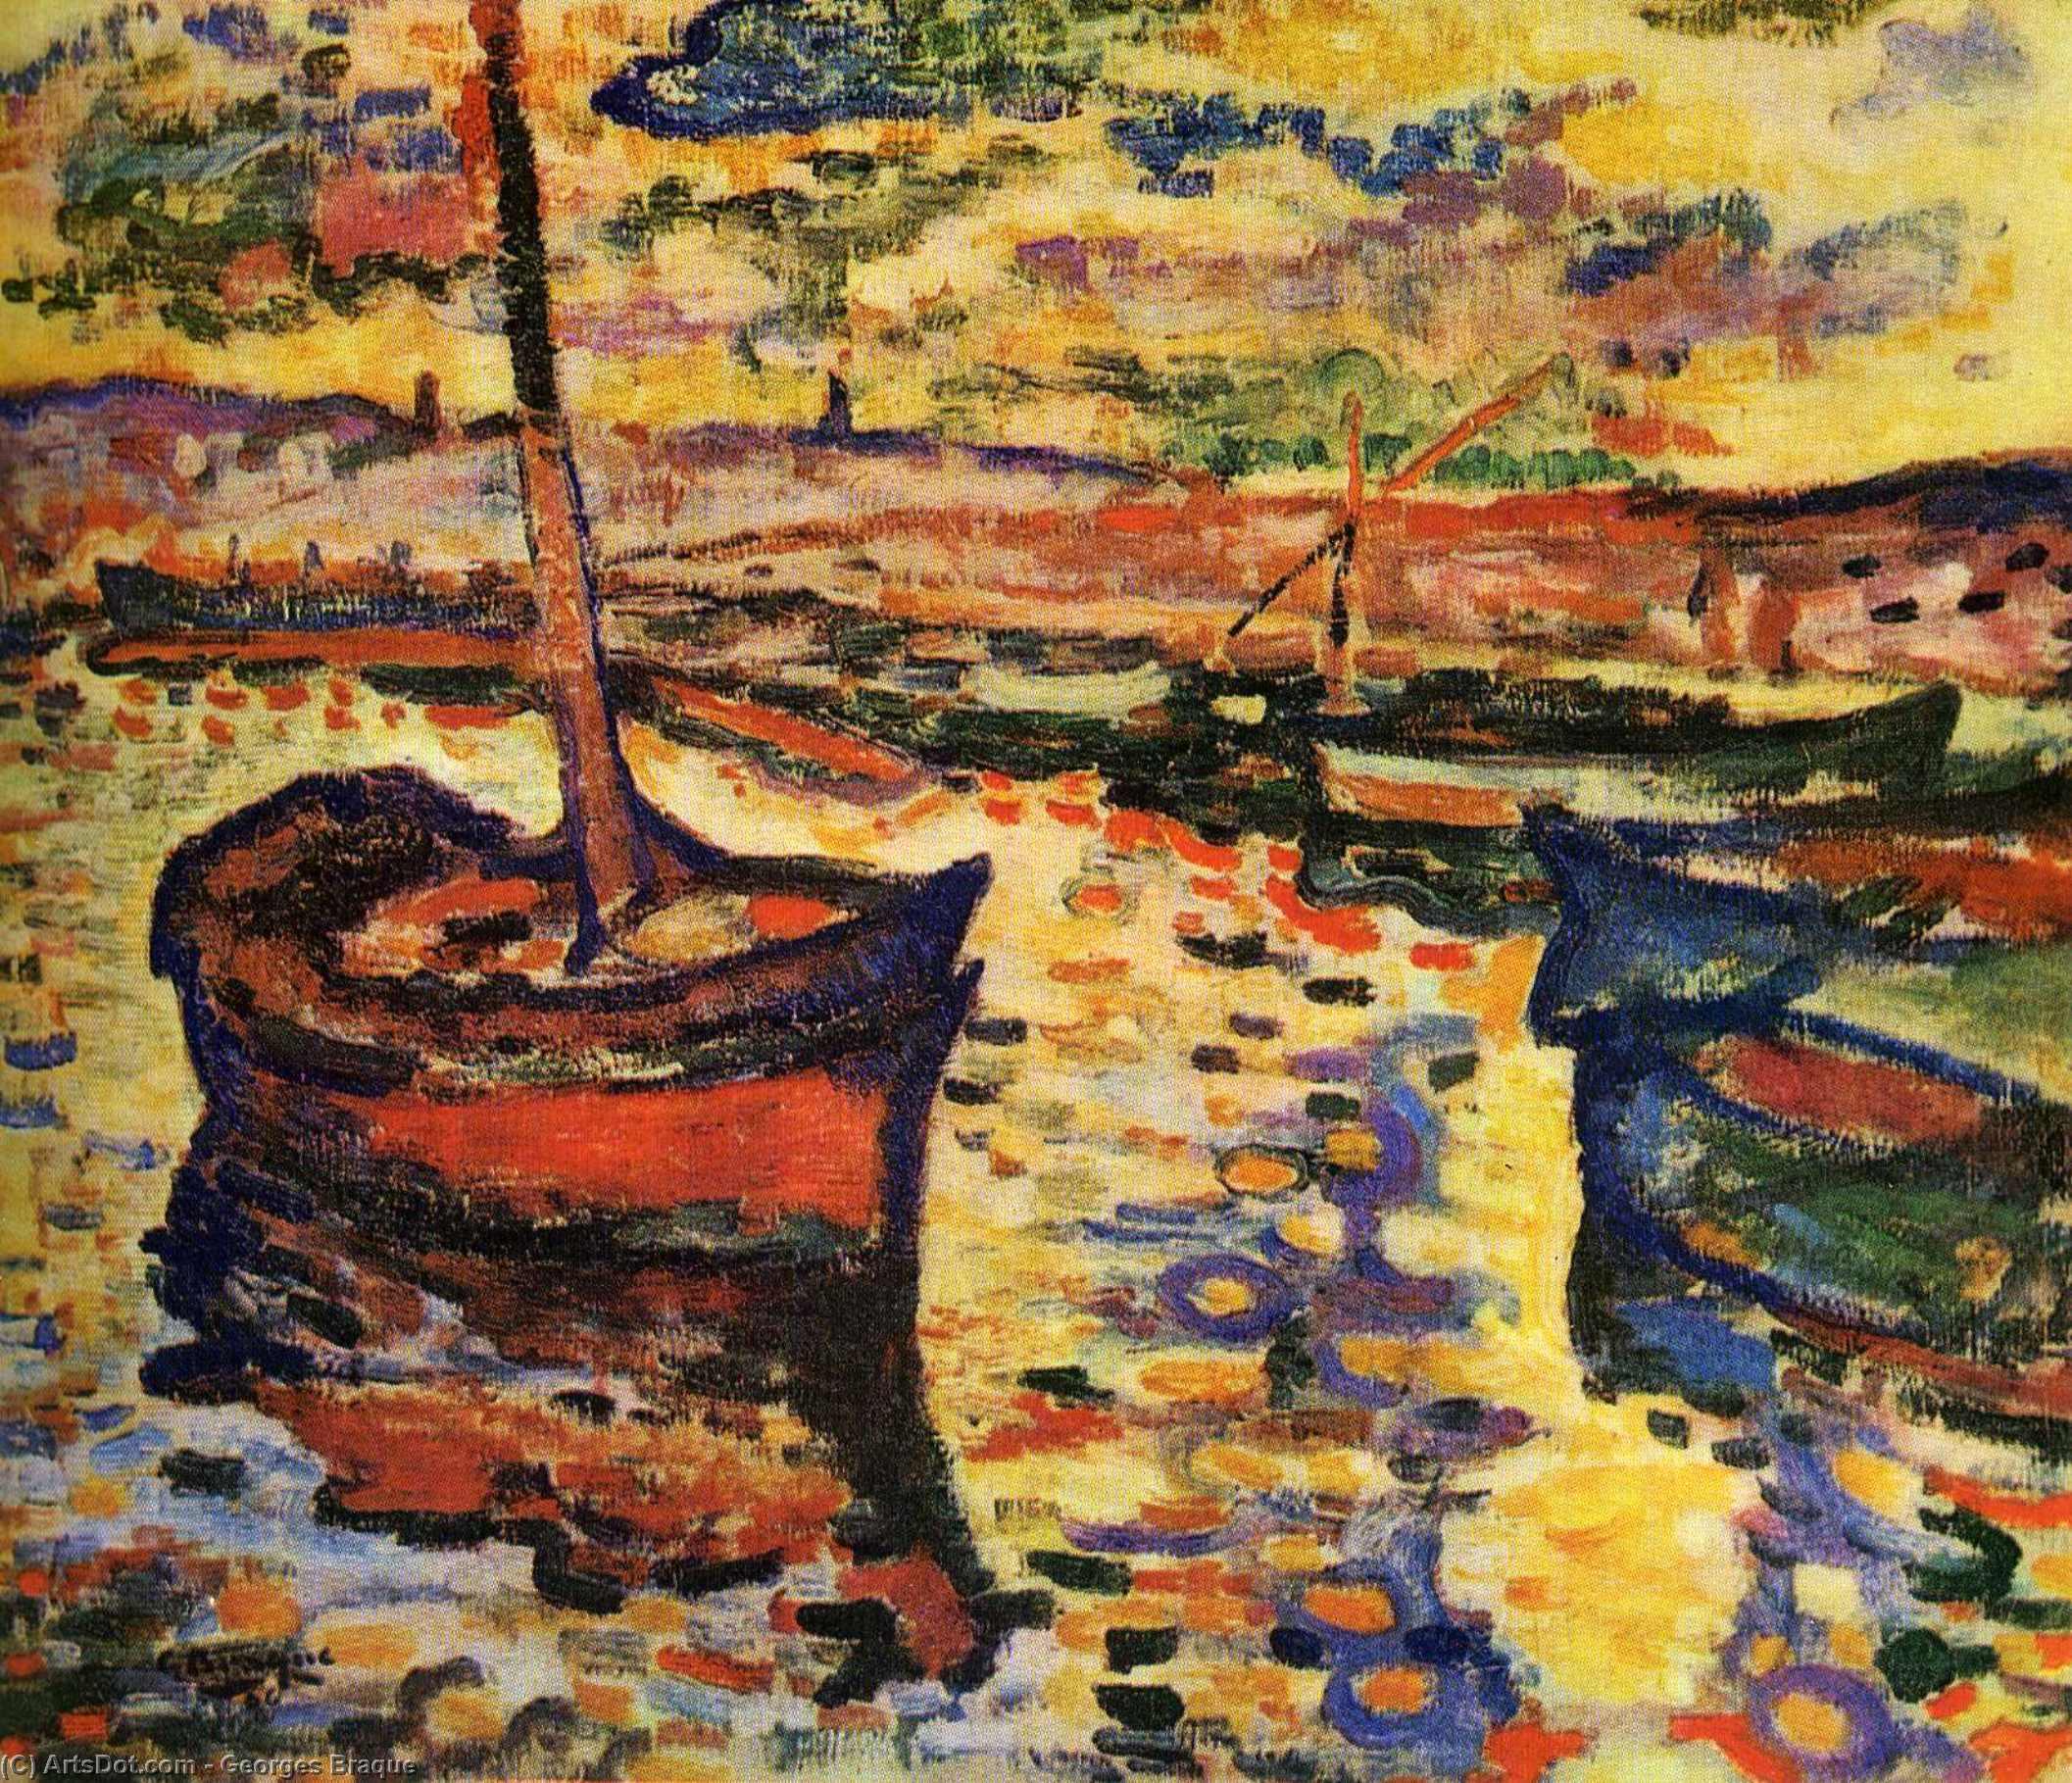 Wikoo.org - موسوعة الفنون الجميلة - اللوحة، العمل الفني Georges Braque - The Harbor